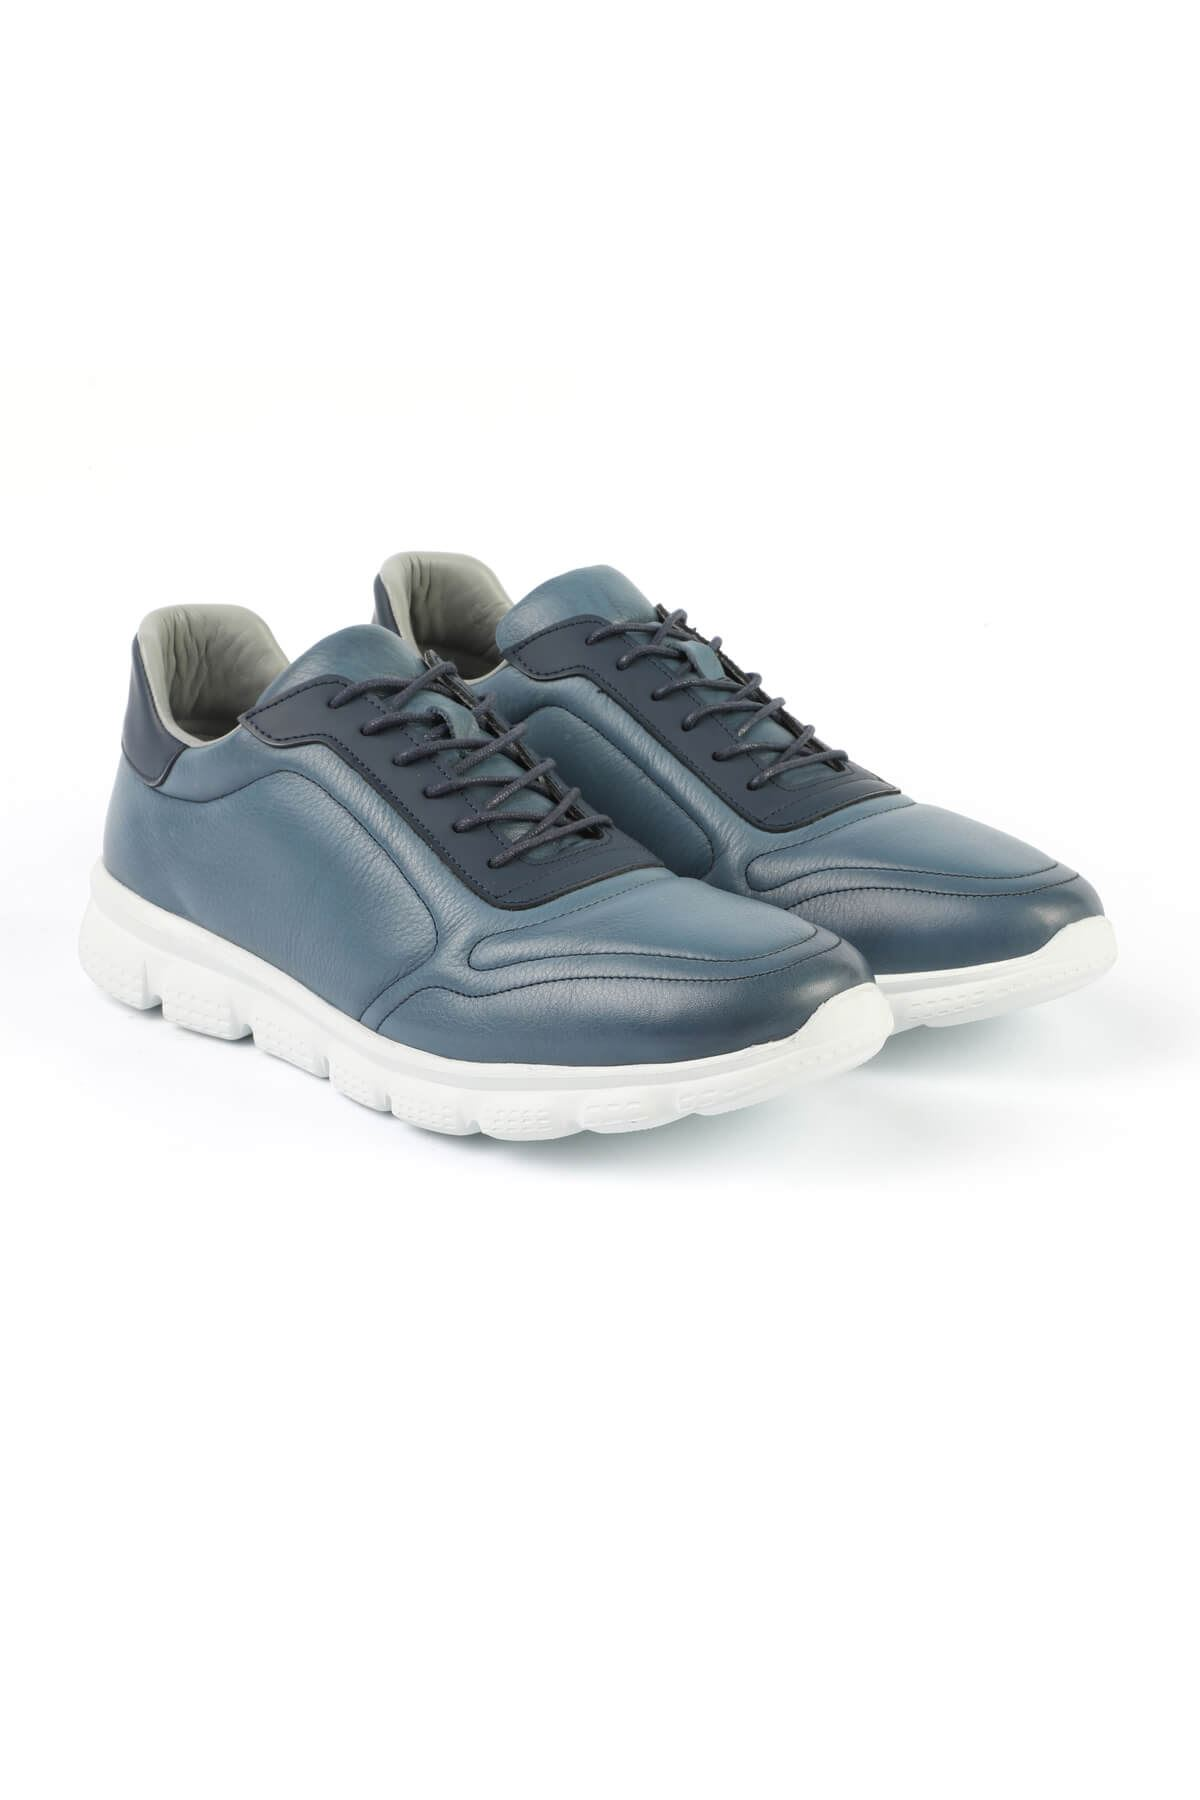 Libero 3121 Blue Sport Shoes